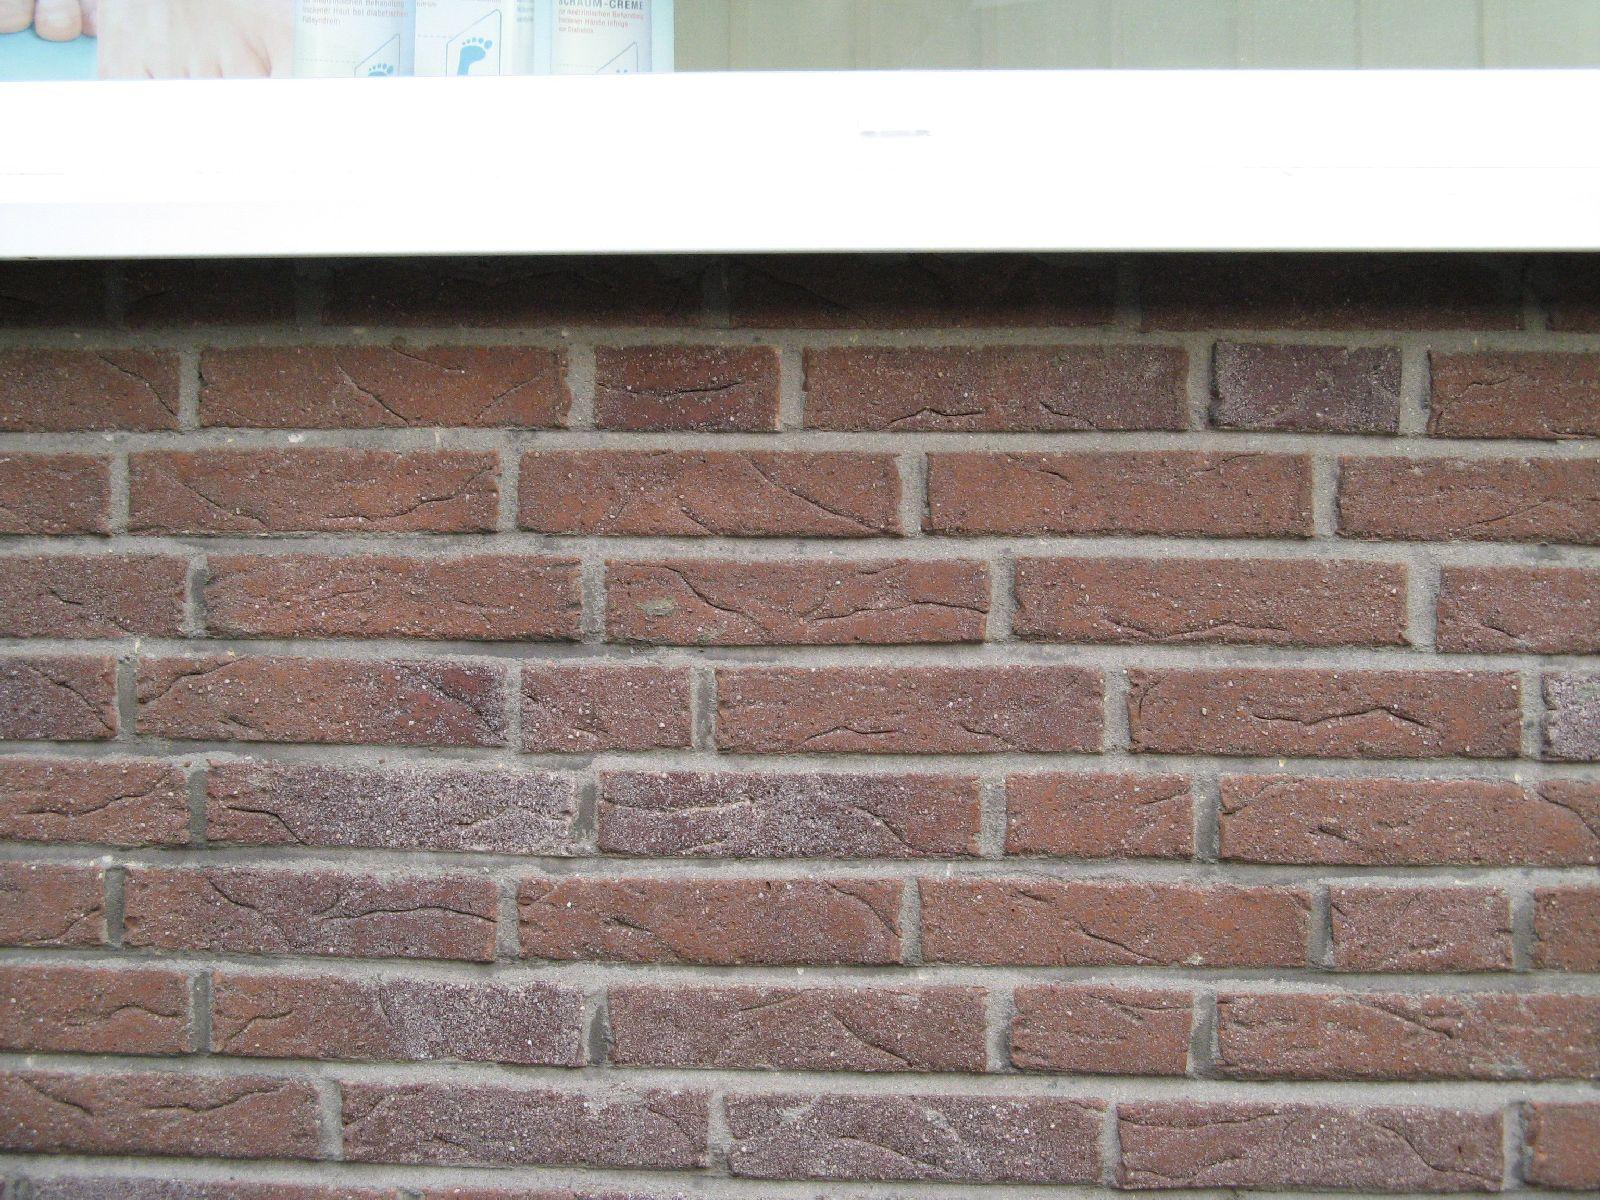 Brick_Texture_B_0714